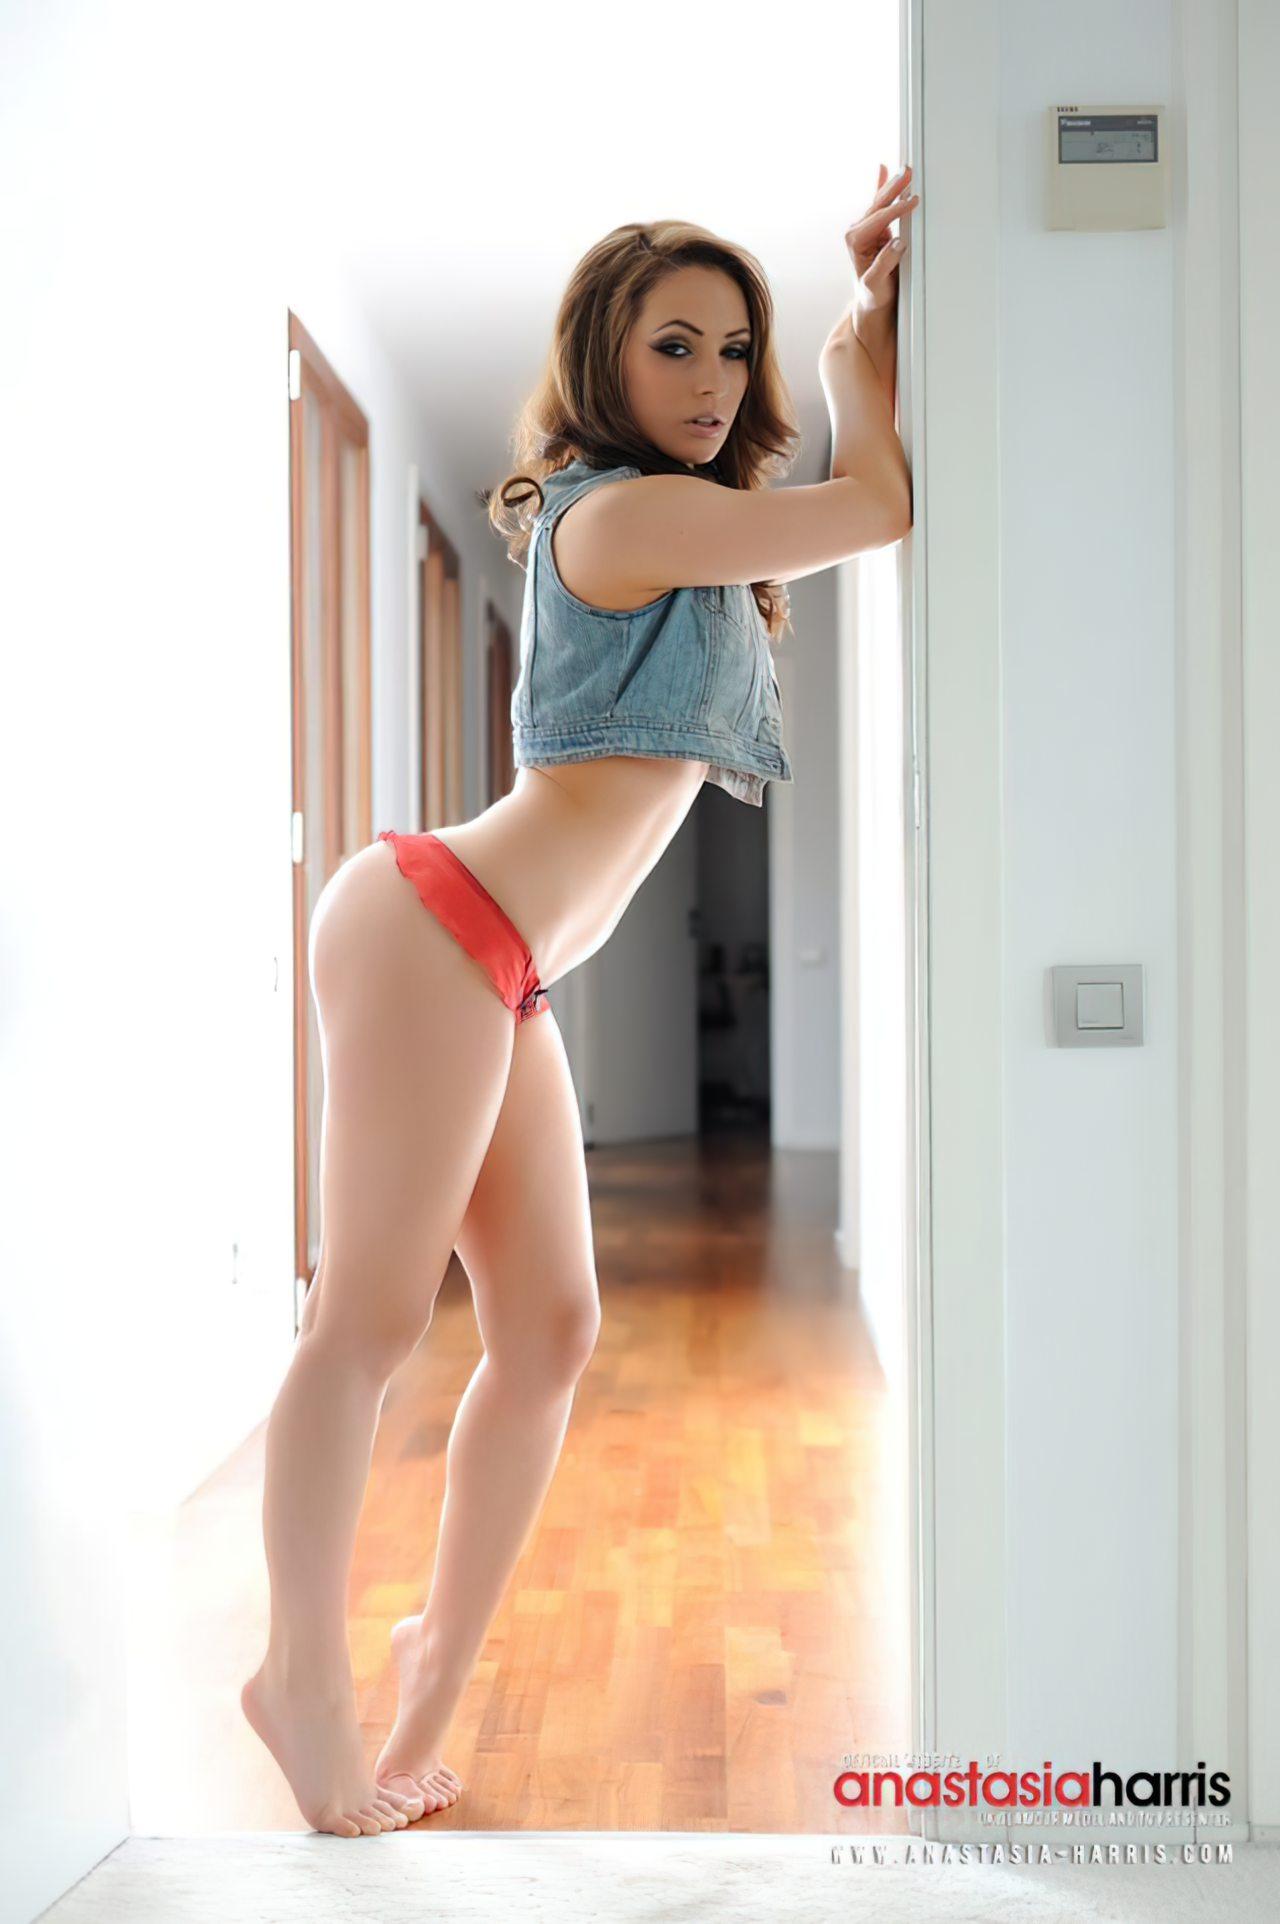 Anastasia Harris (3)